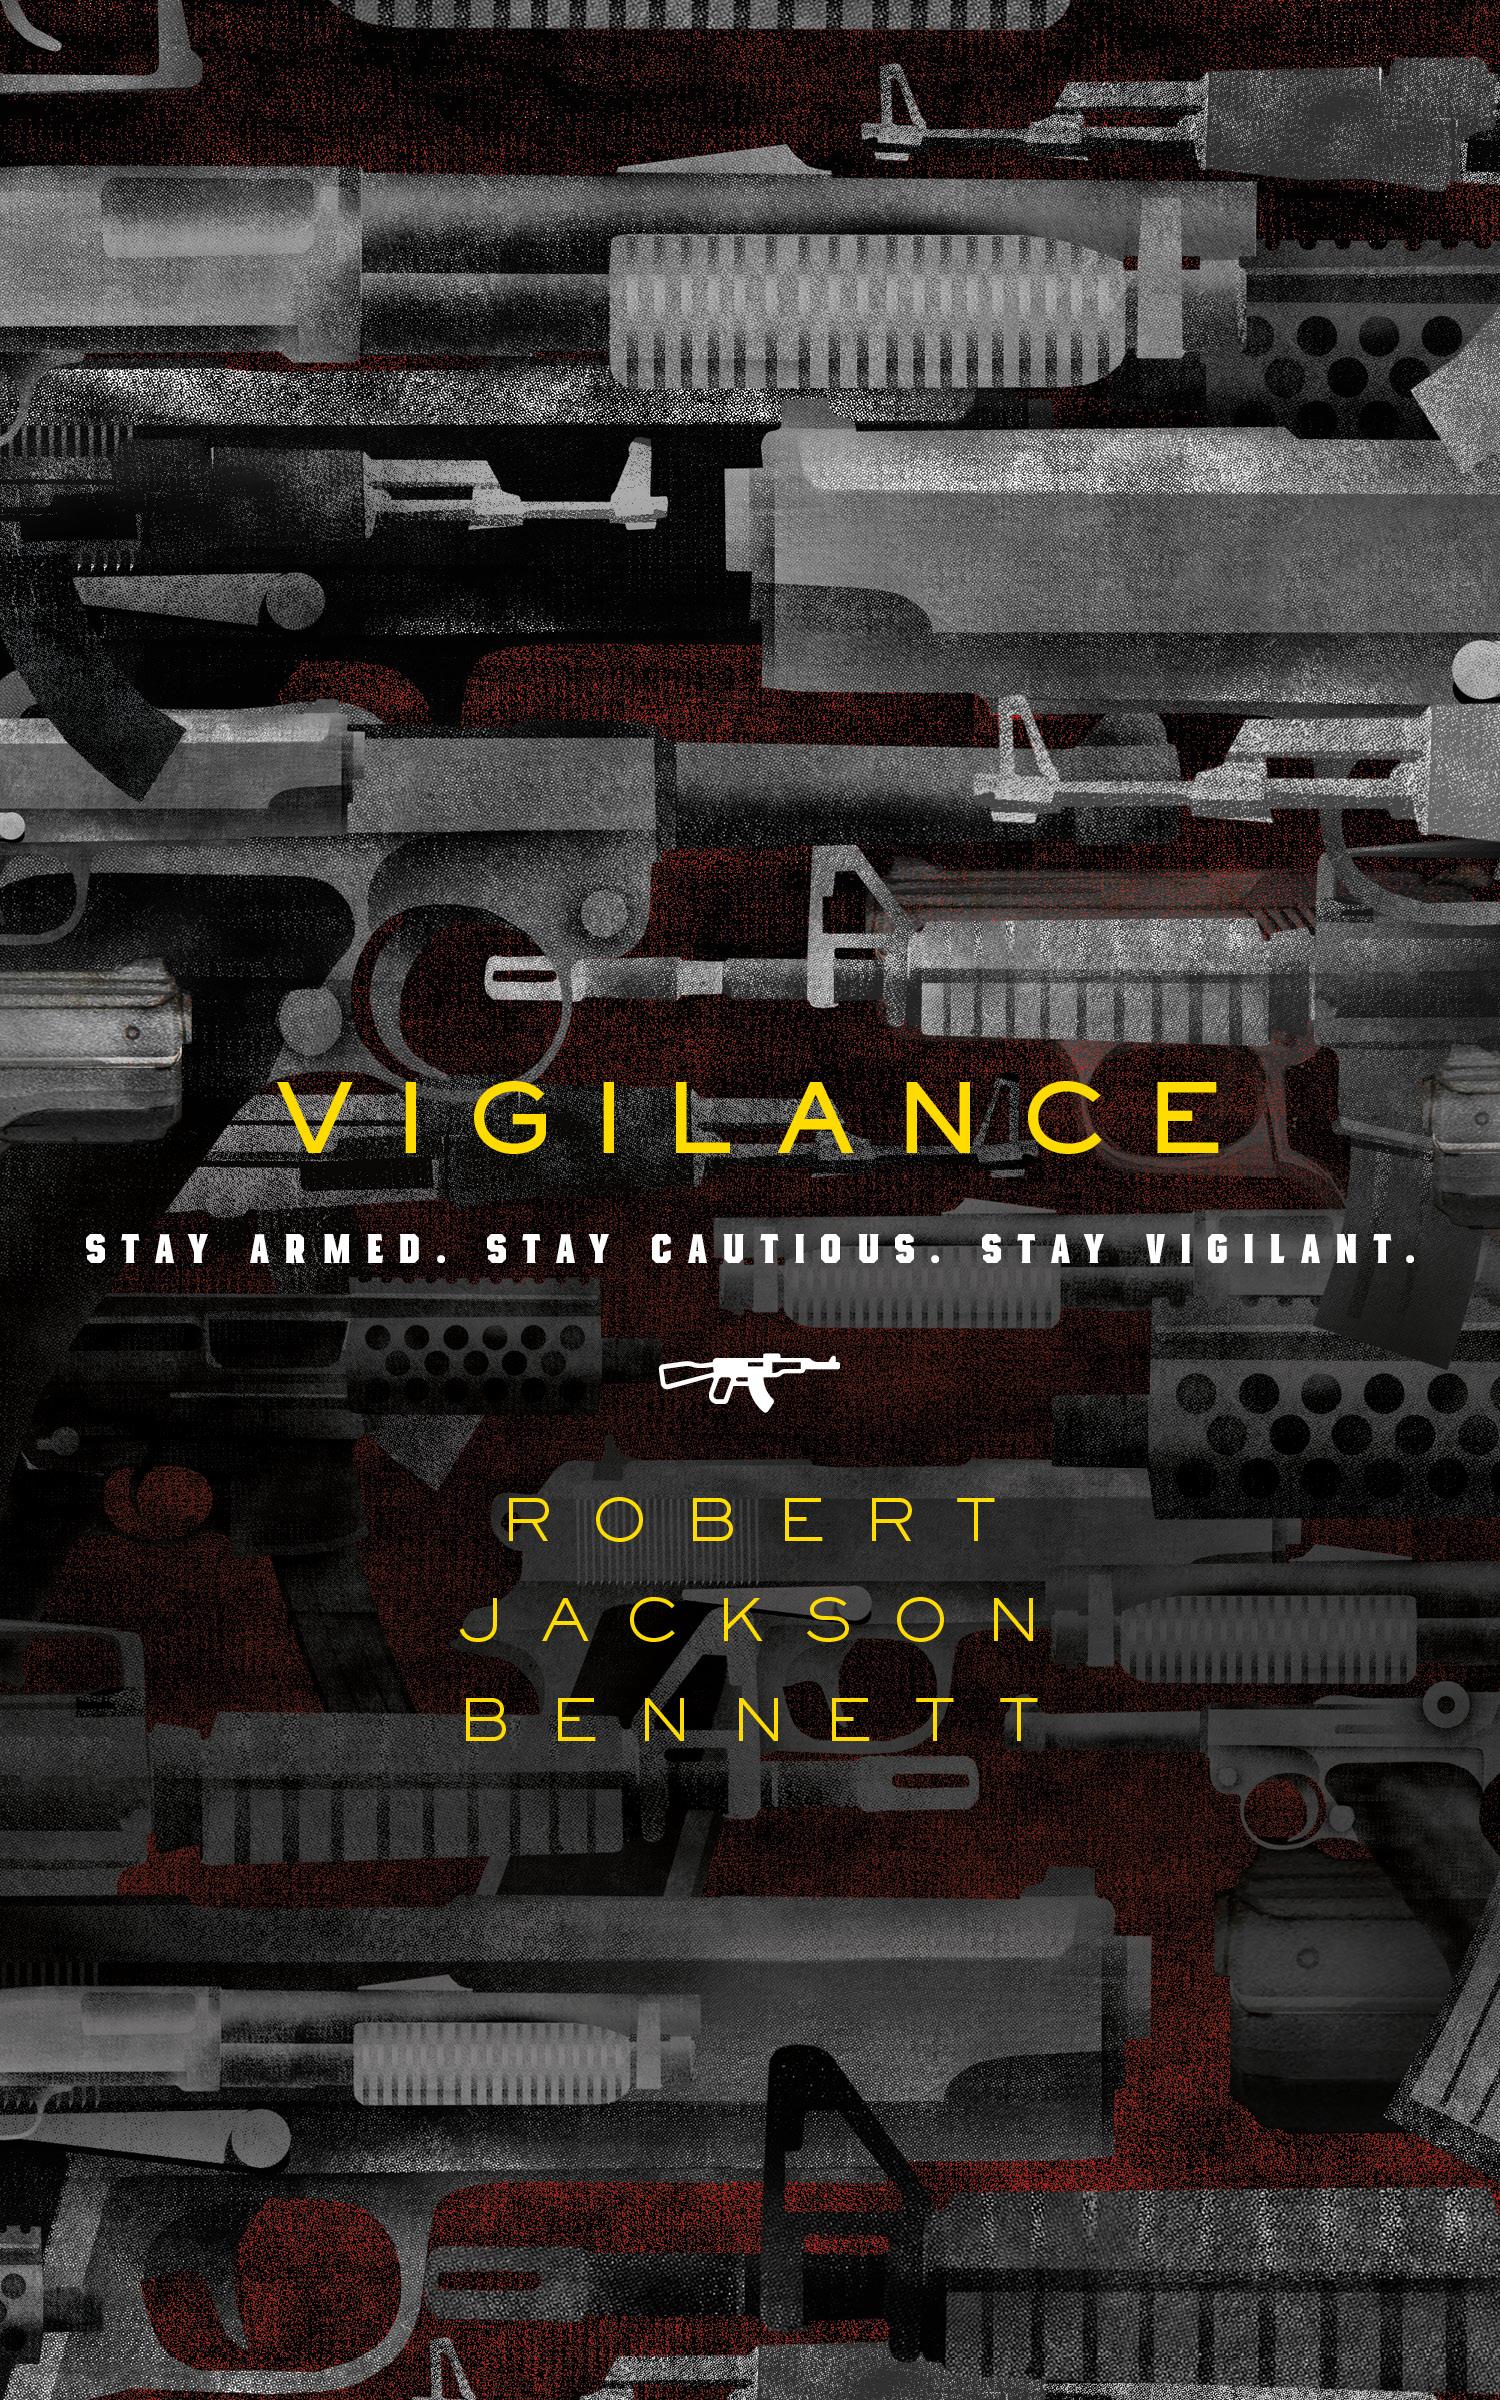 Vigilance Robert Jackson Bennett